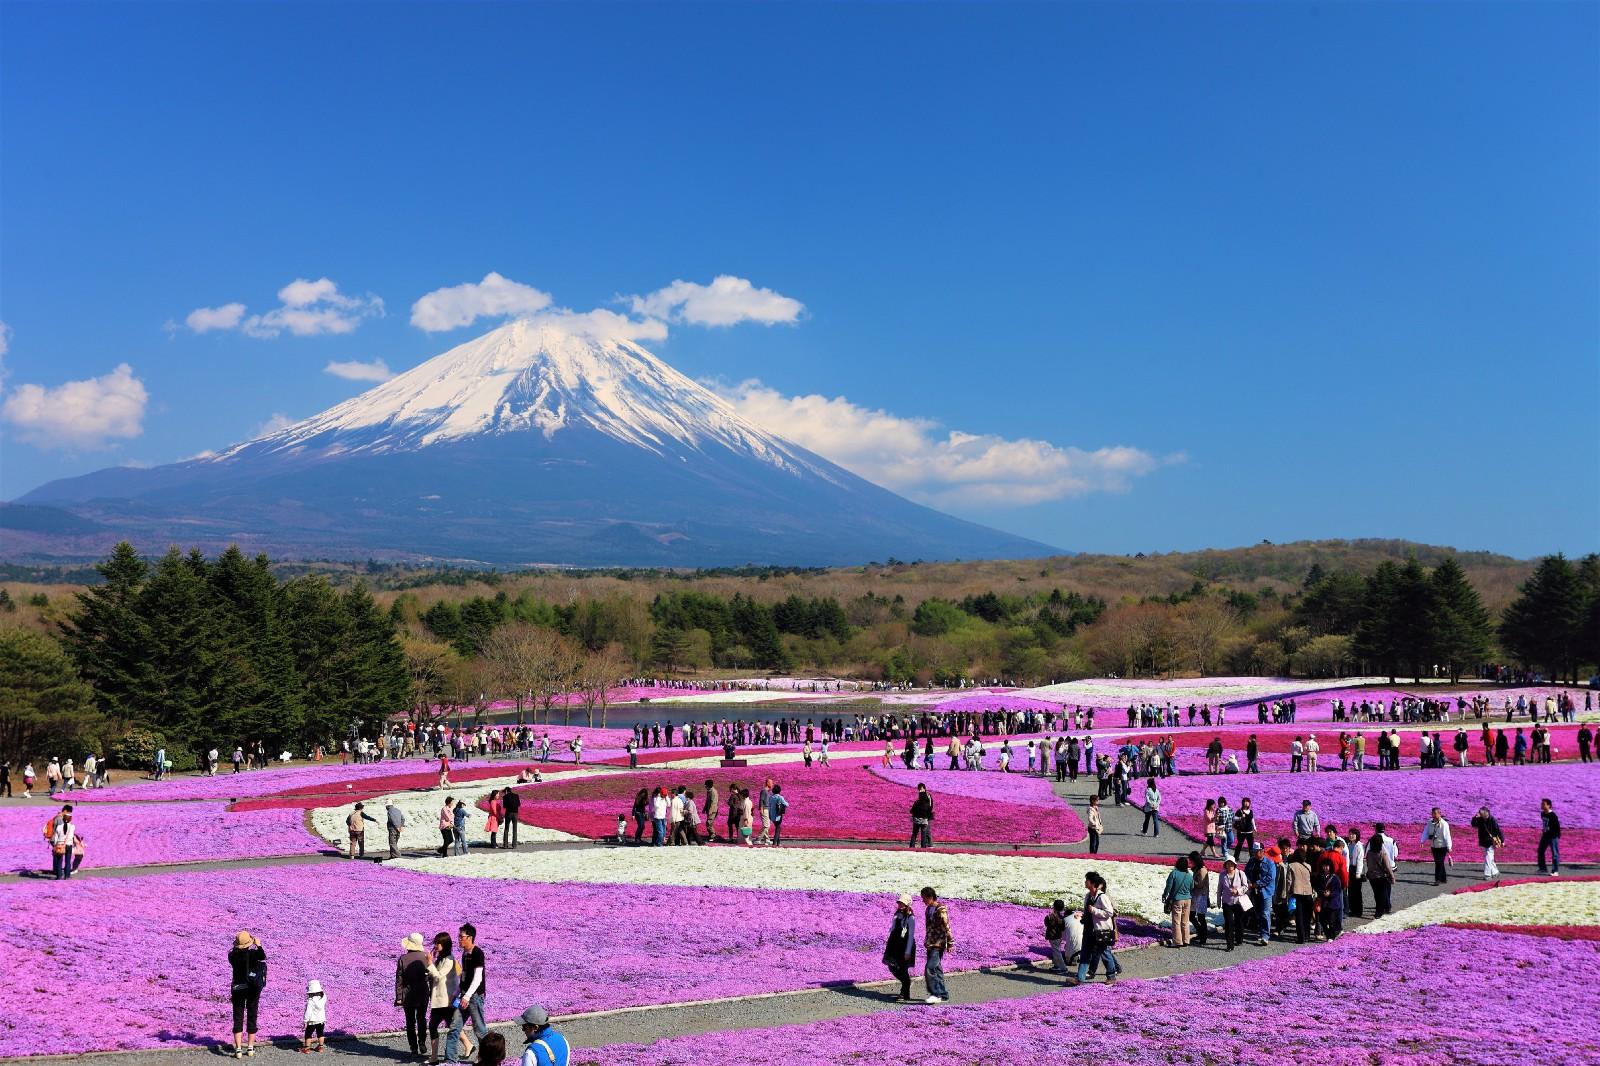 2021 Fuji Shibazakura Festival